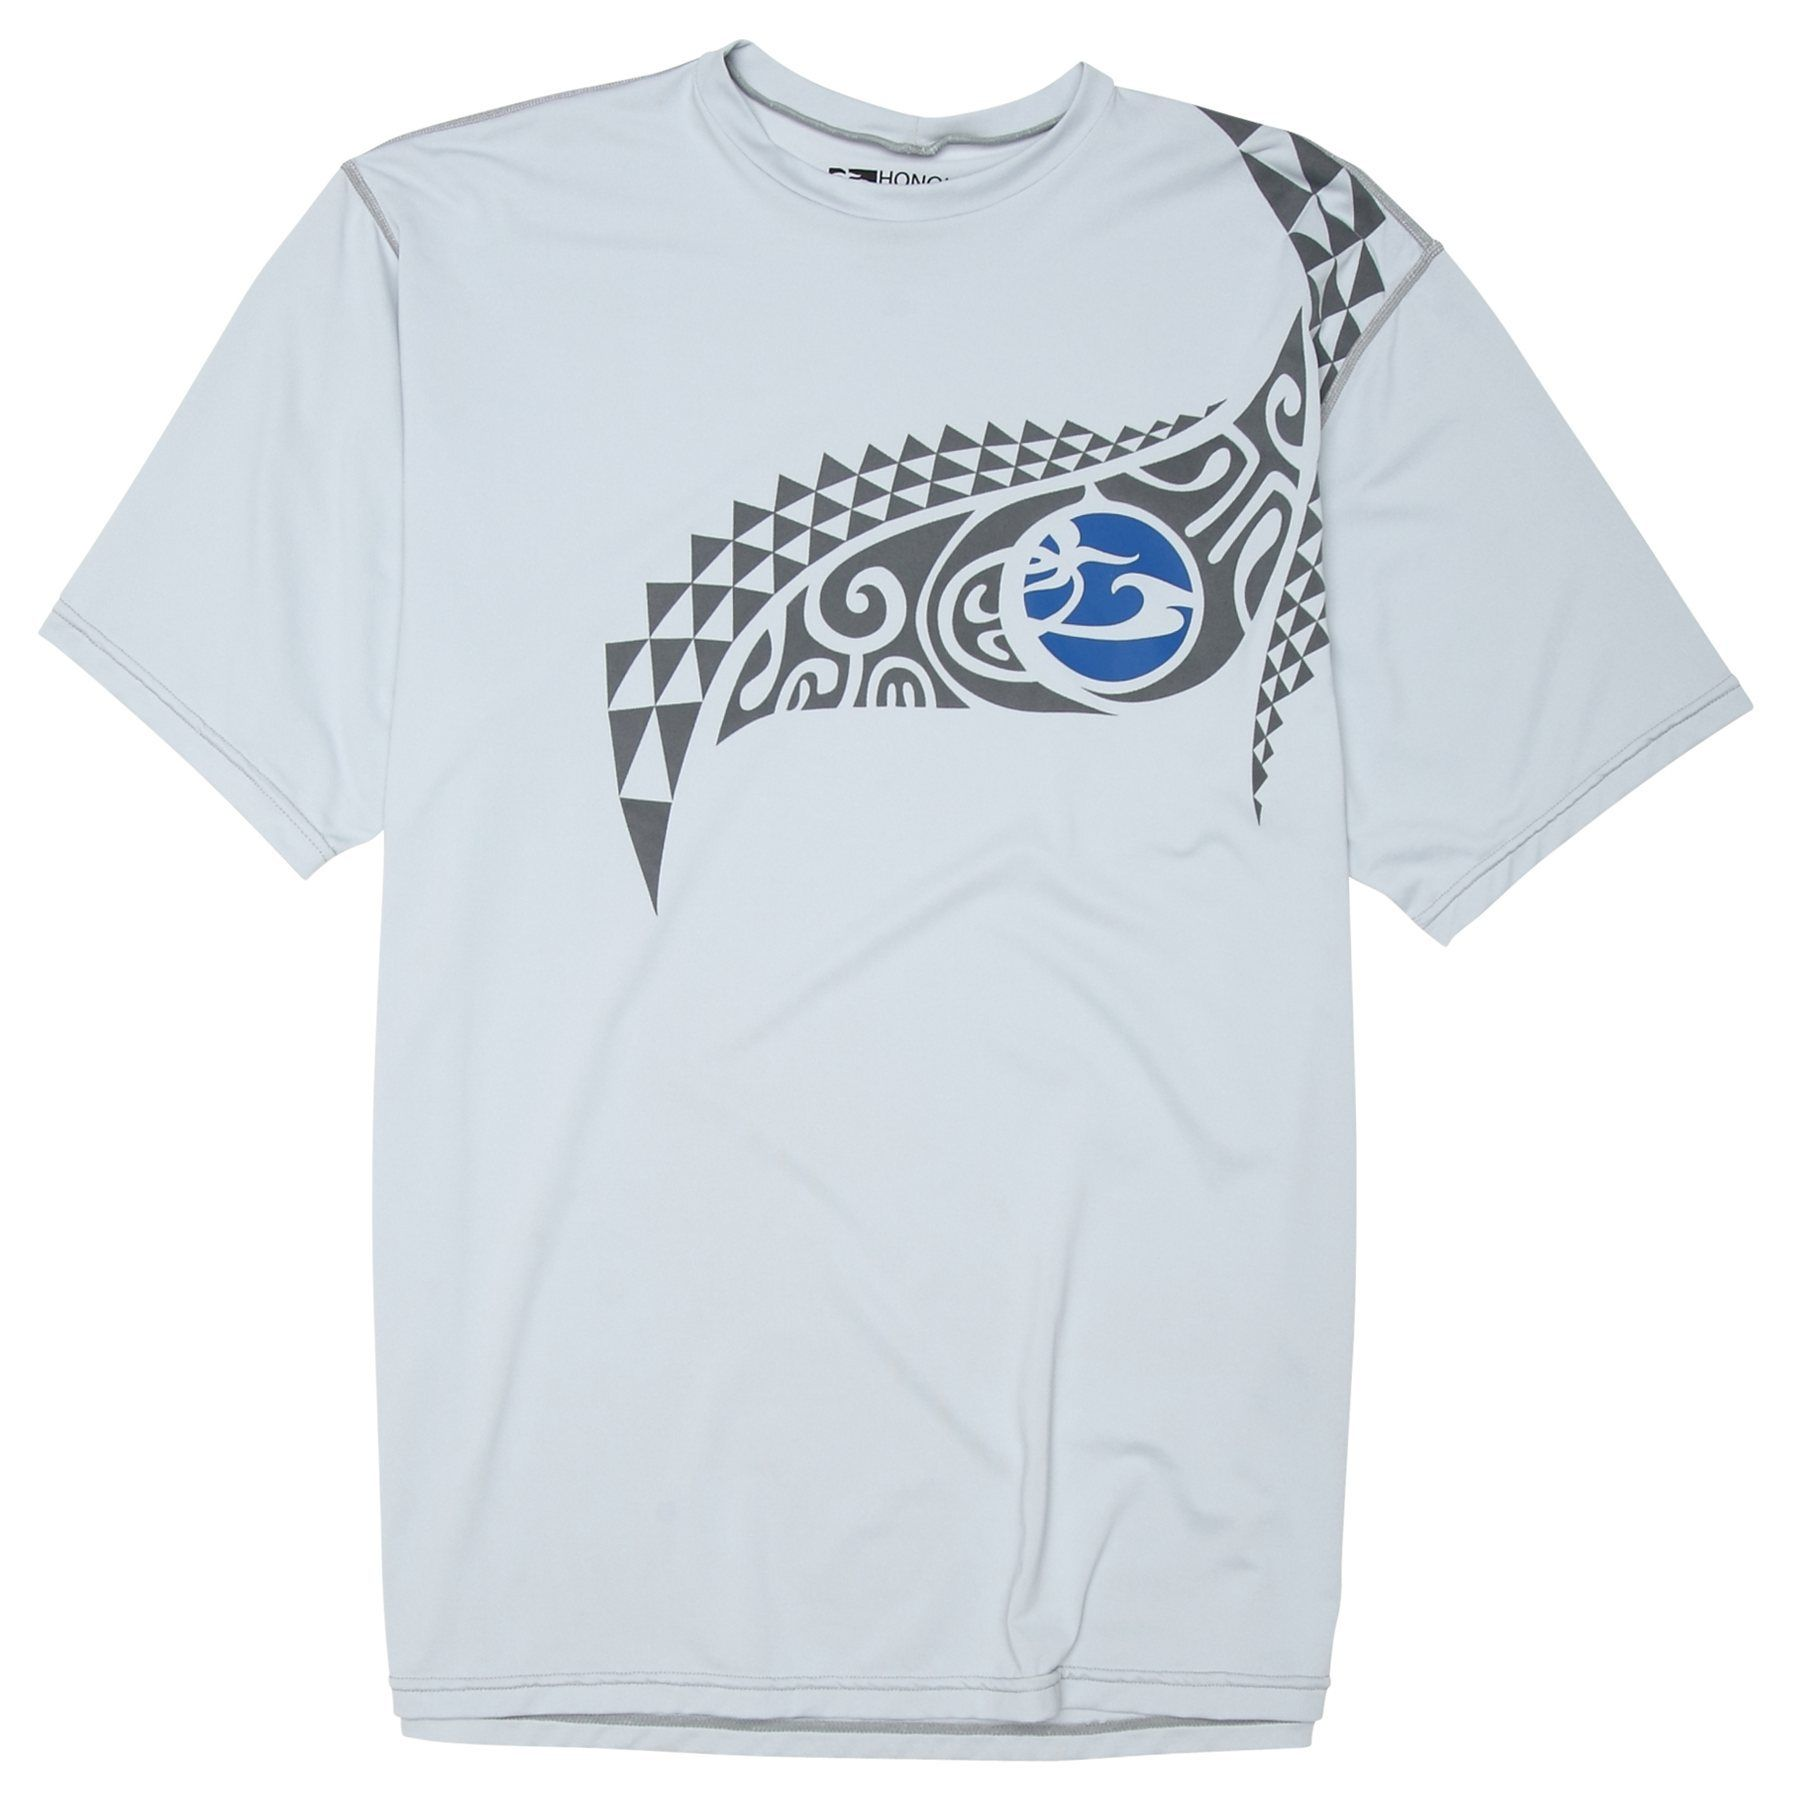 Honolua Surf Mens : UV Shirts - Kewalo | SUP Brands